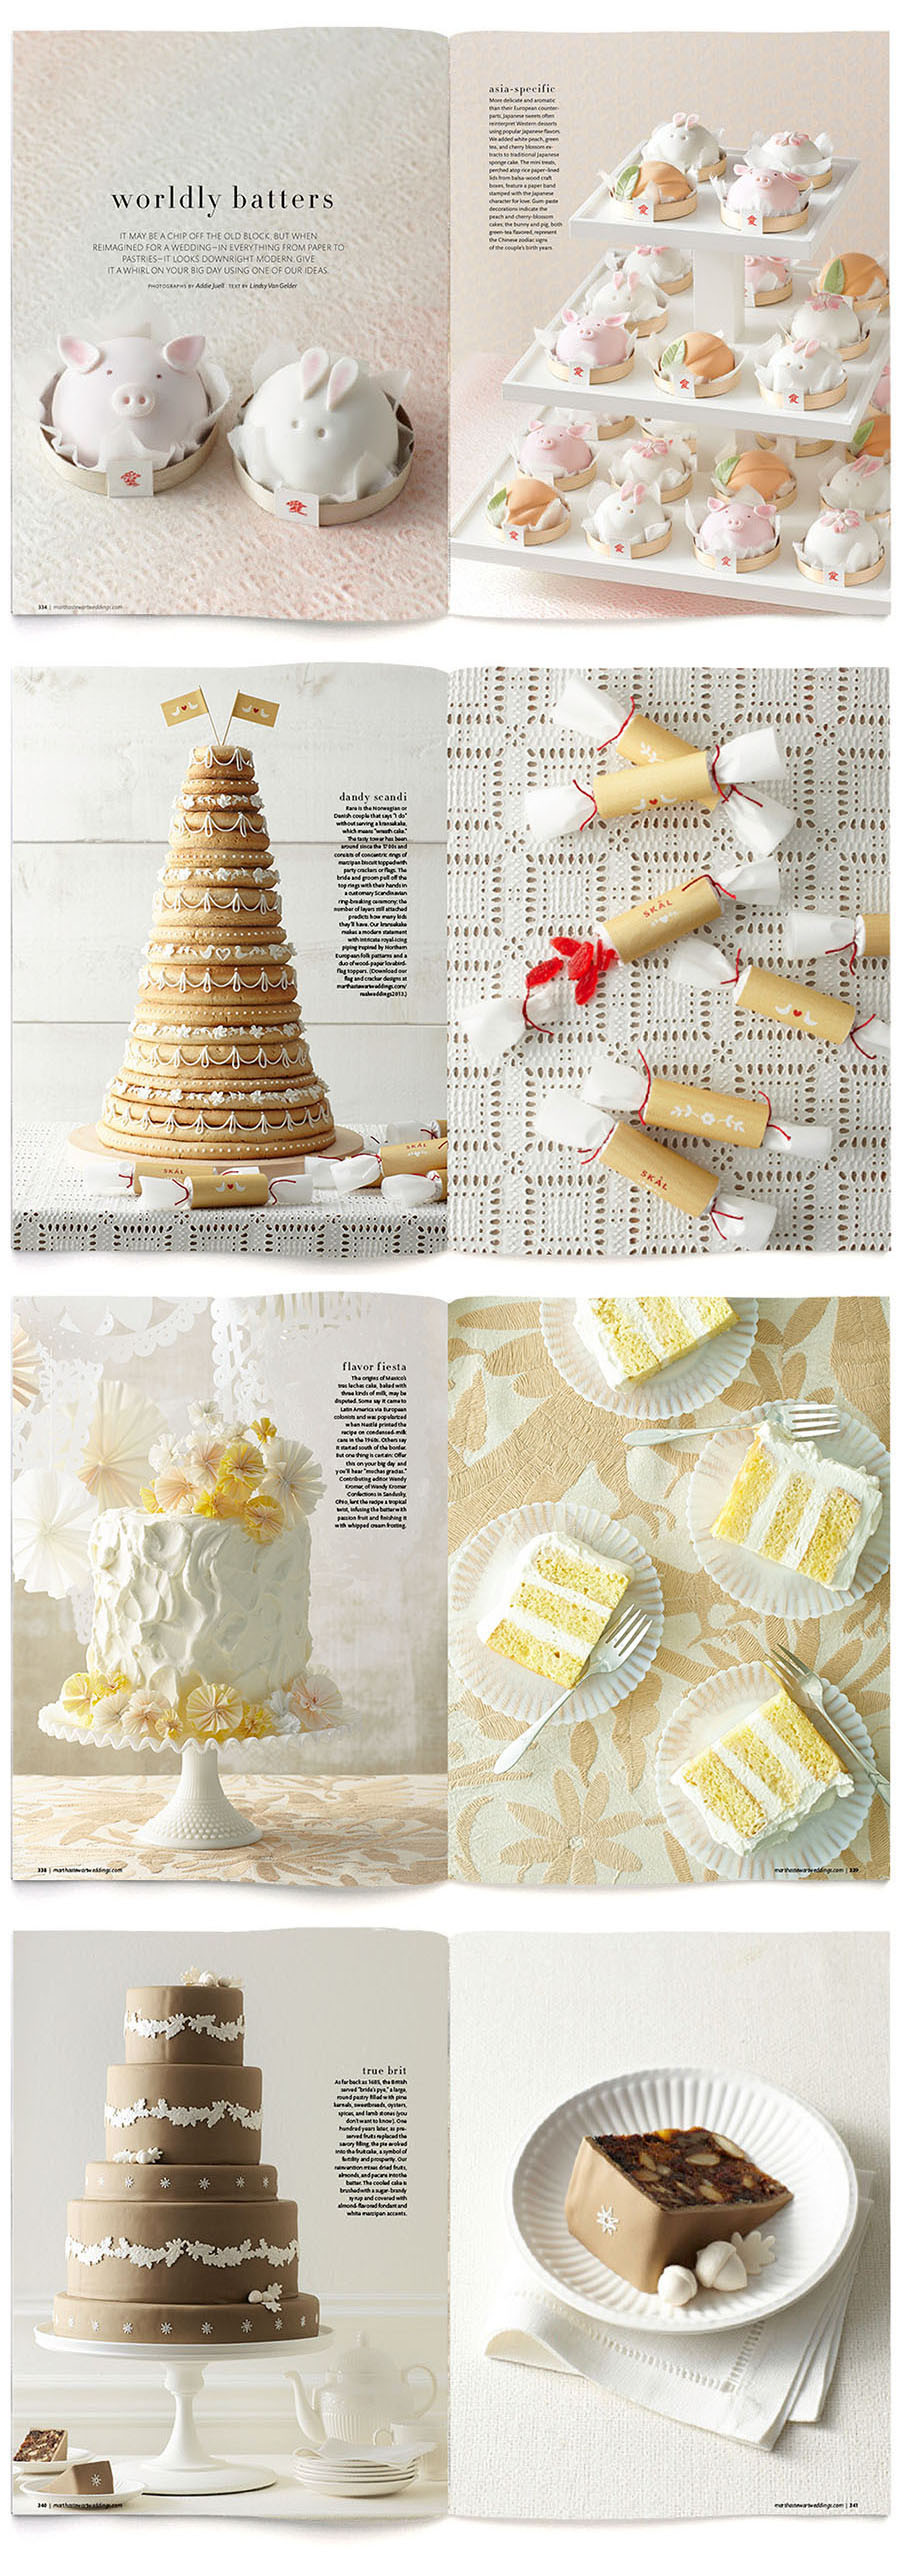 cultural cakes.jpg